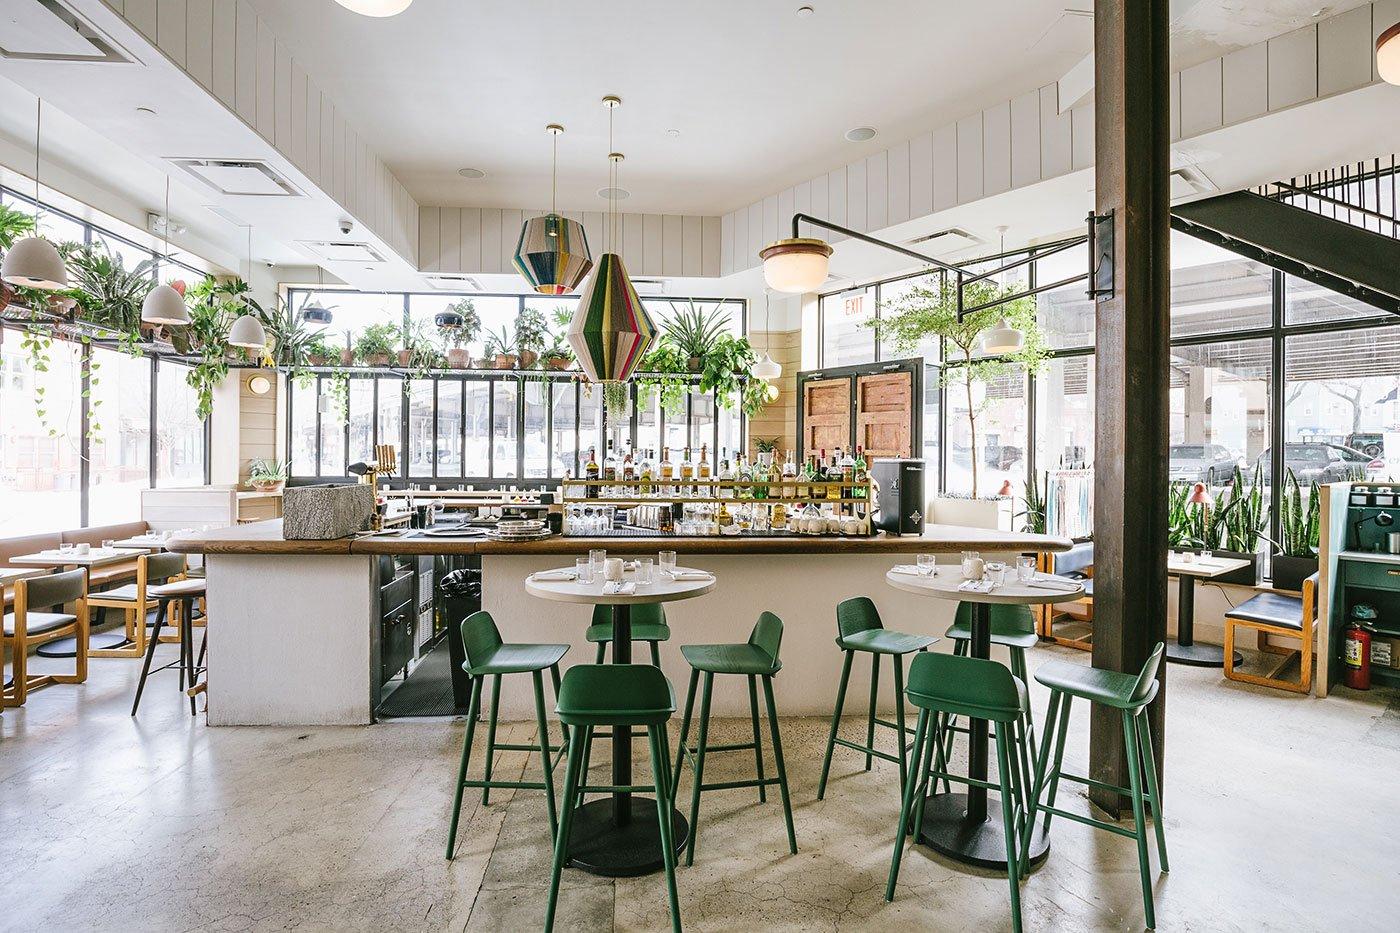 llama-inn-restaurant-brooklyn